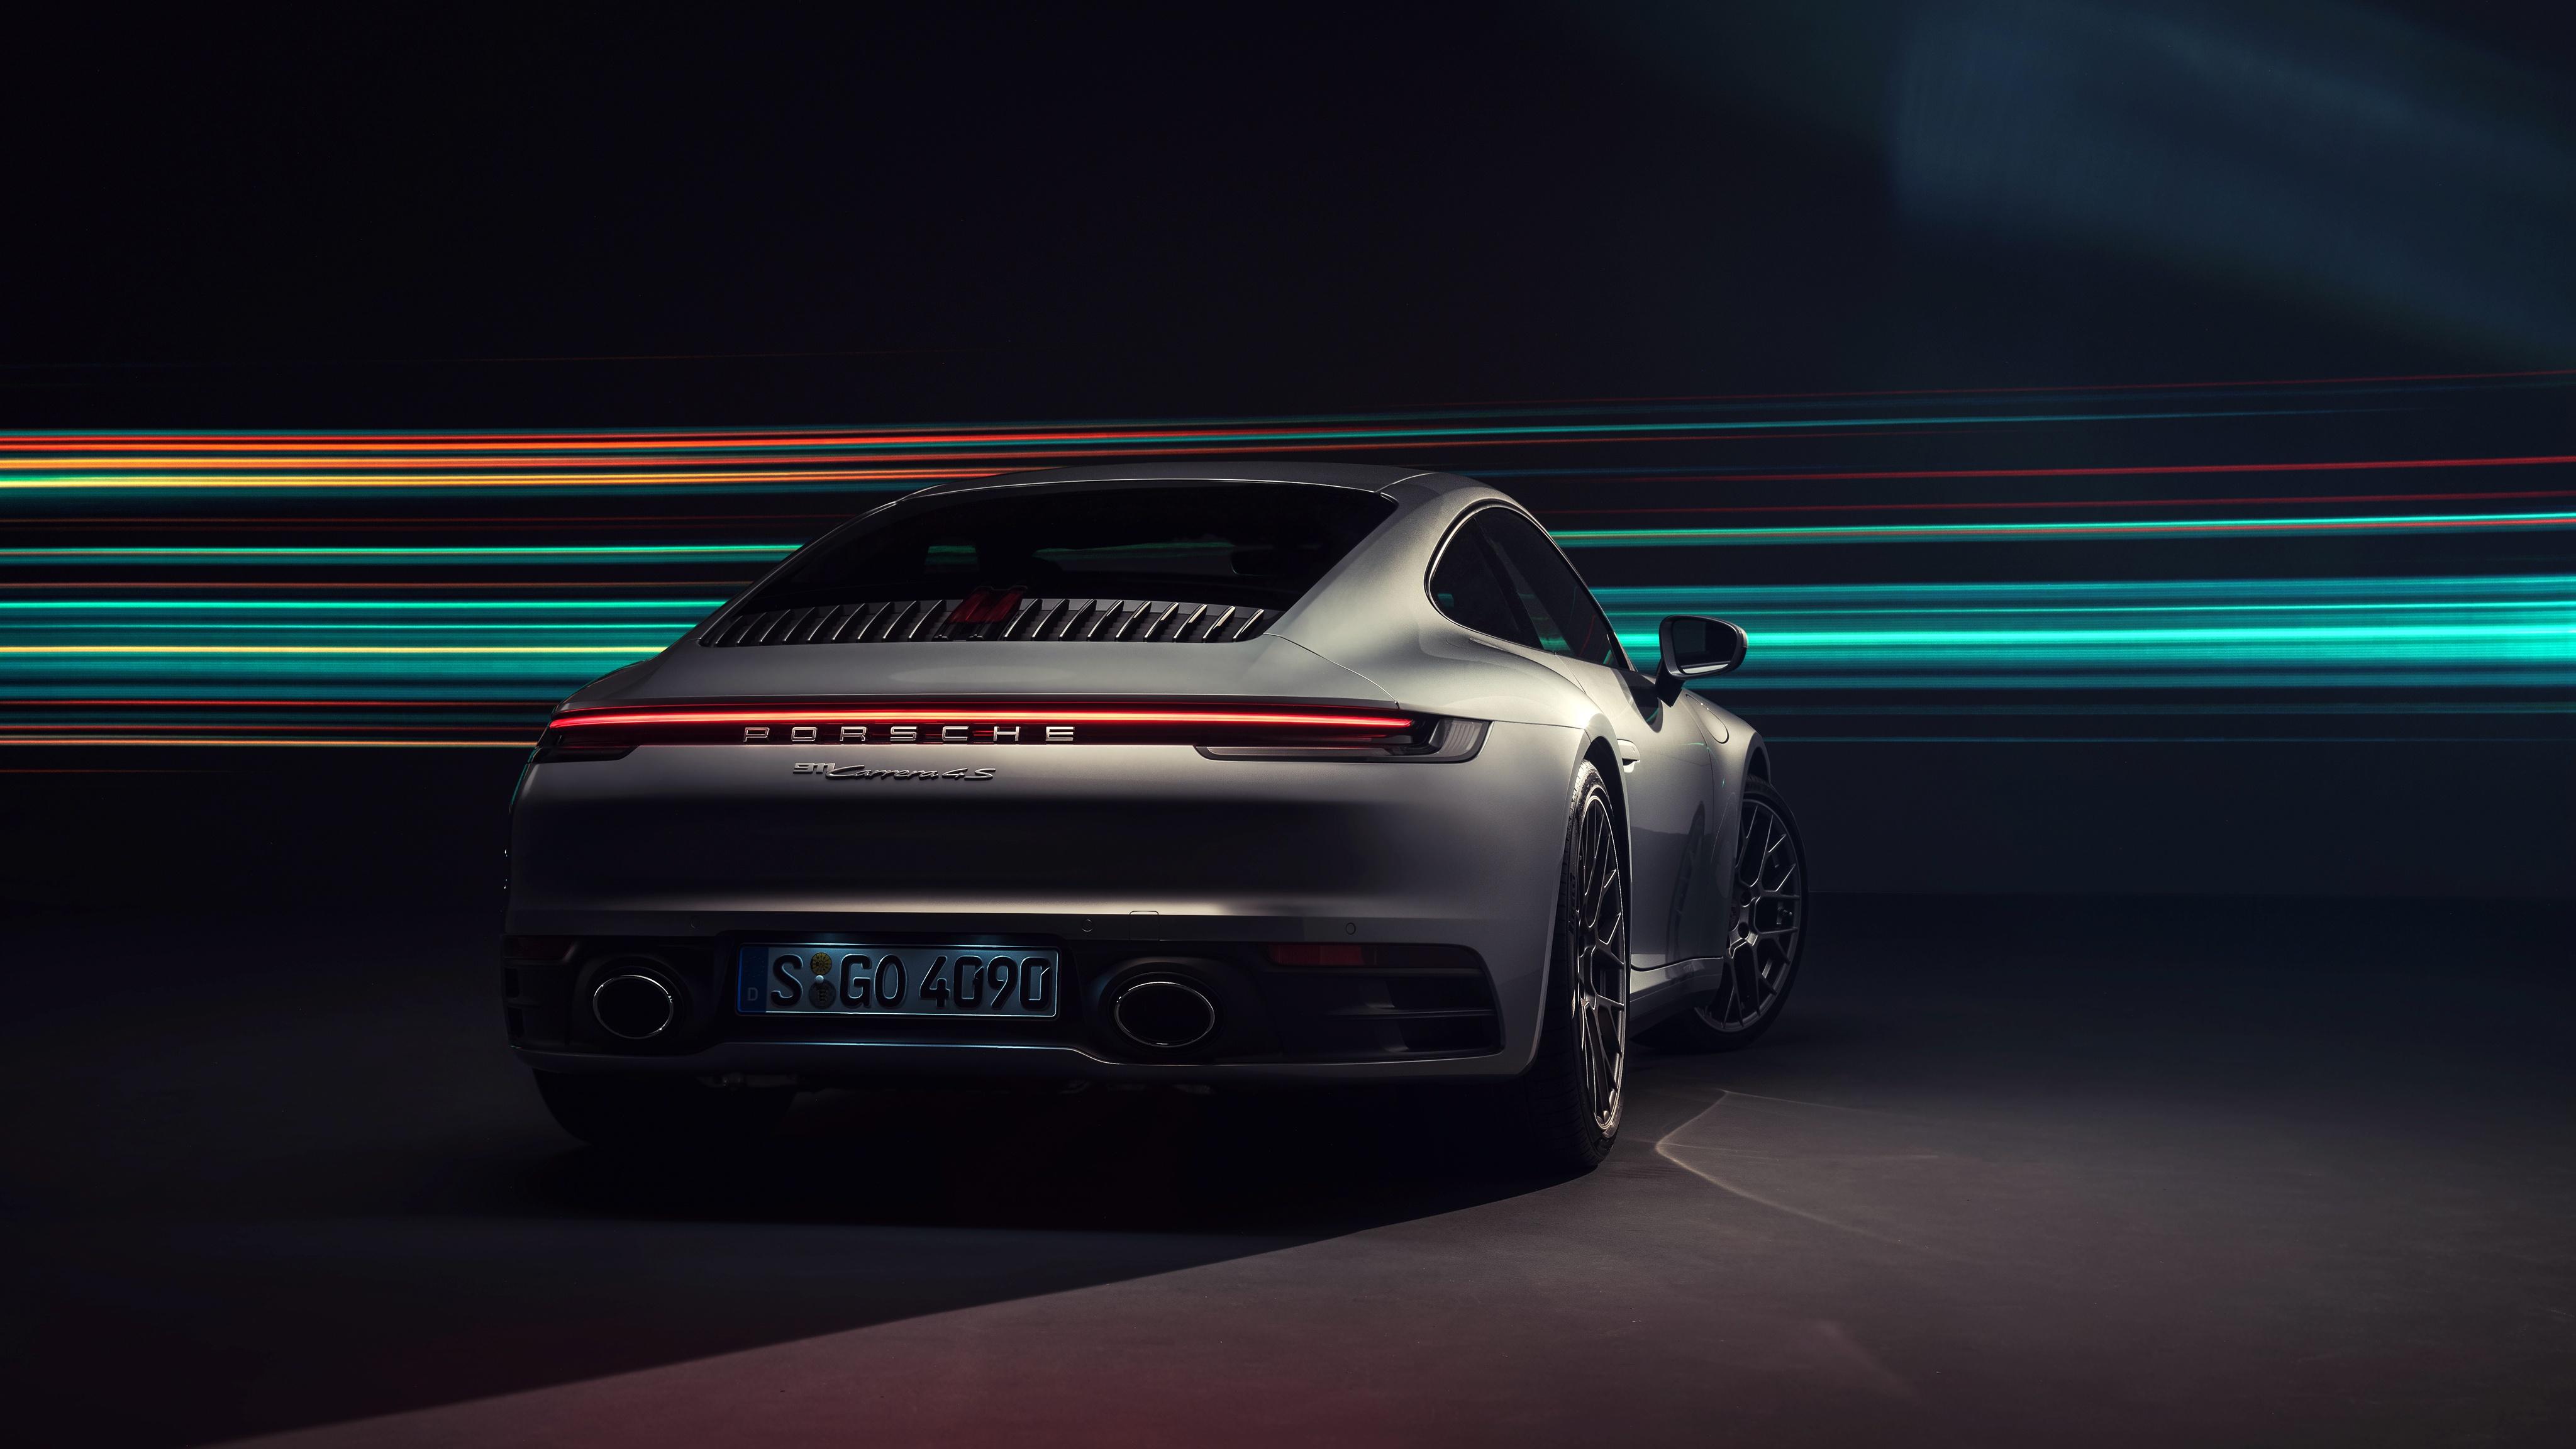 2019 porsche 911 carrera 4s hd cars 4k wallpapers - Porsche 911 carrera s wallpaper ...